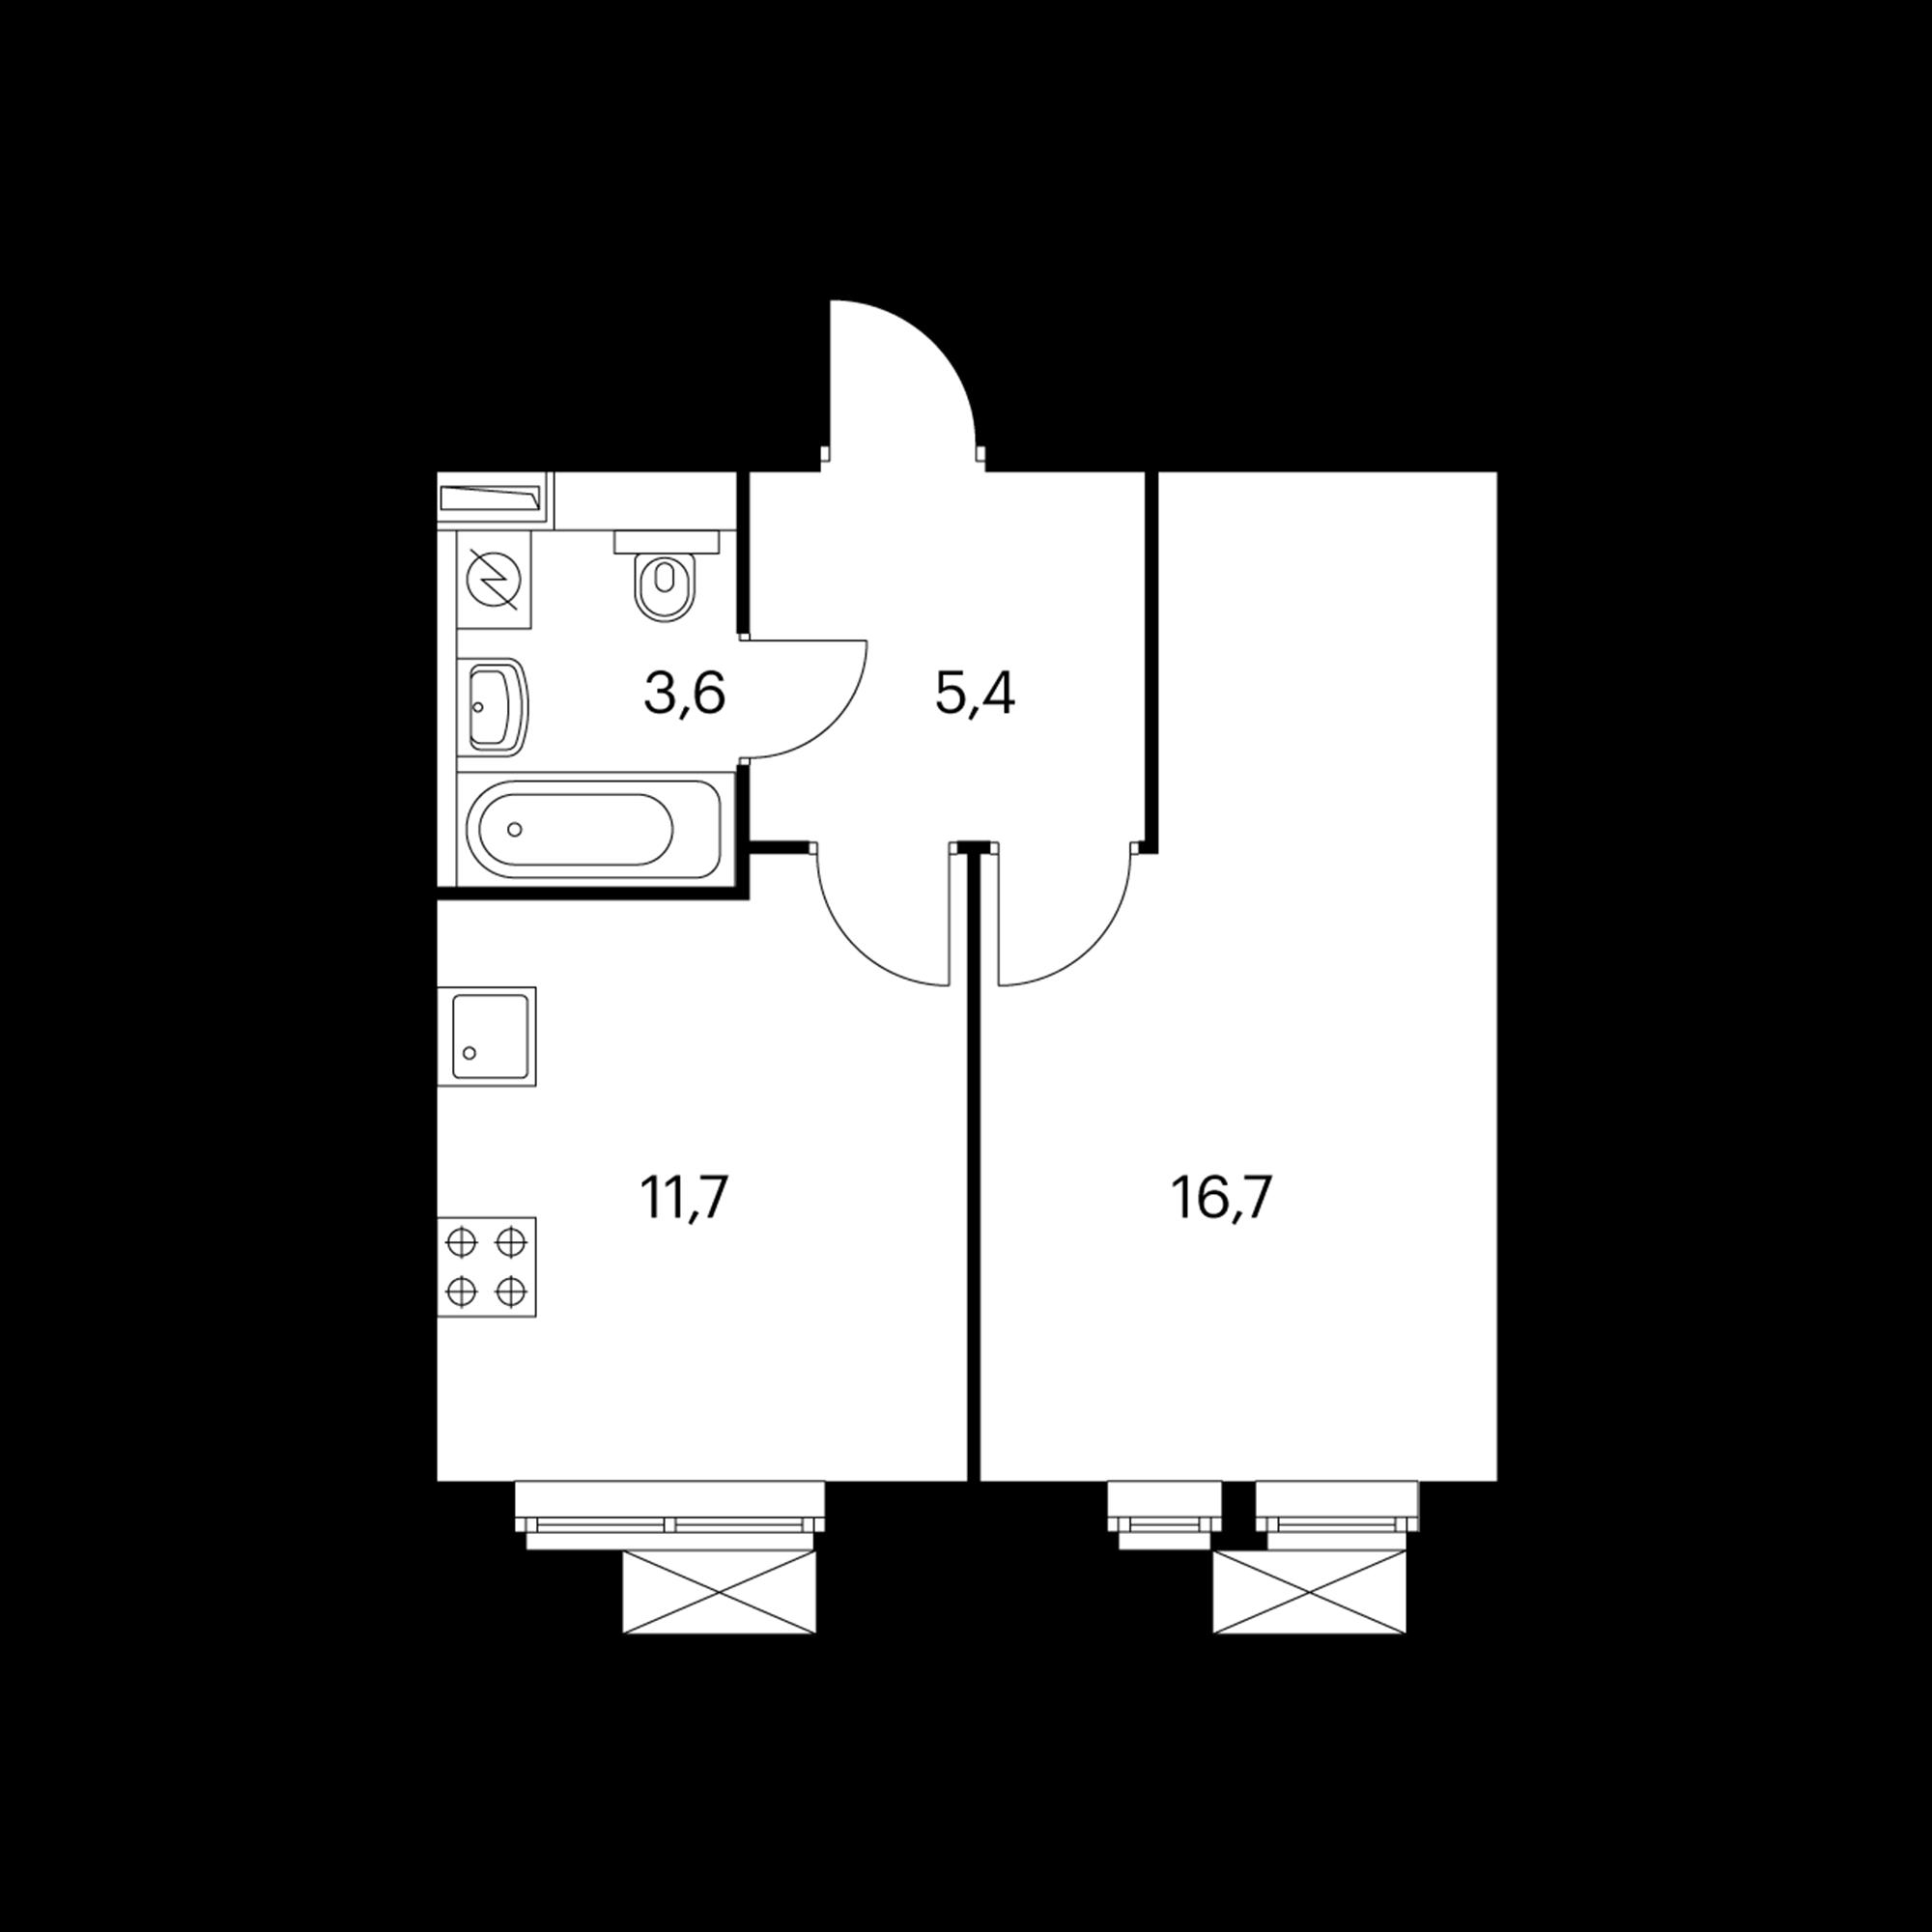 1KM1_6.6-1_S_Z1